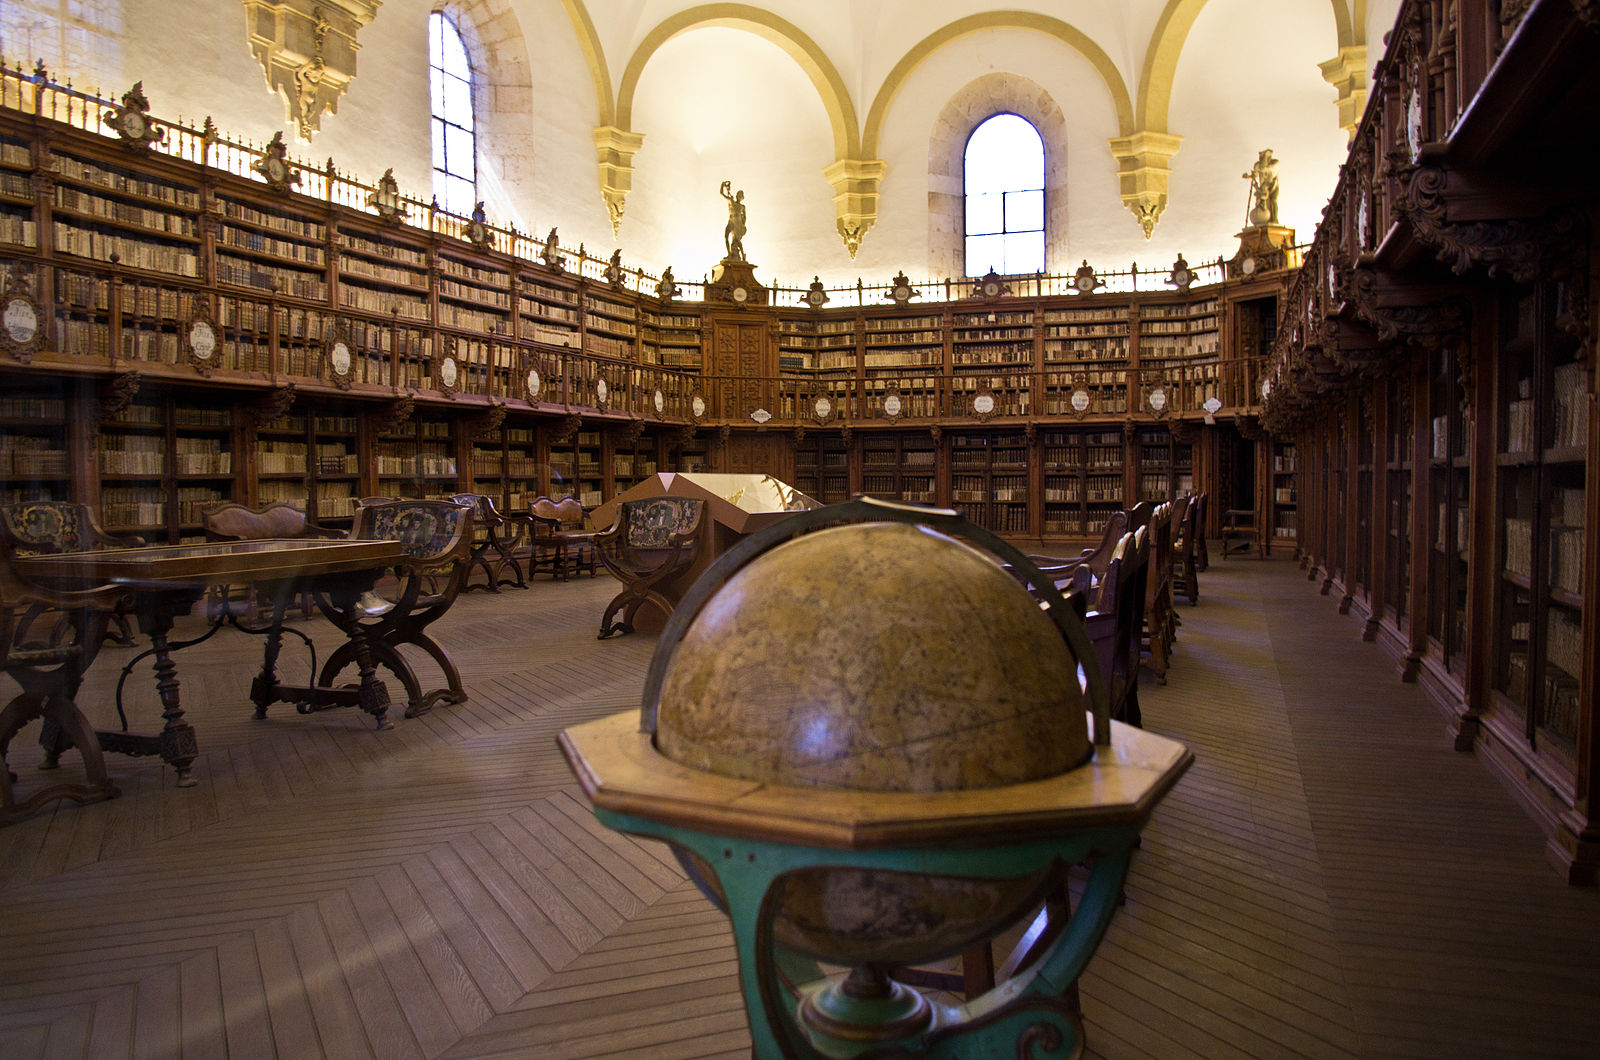 Old_Library_in_University_of_Salamanca_01.jpg